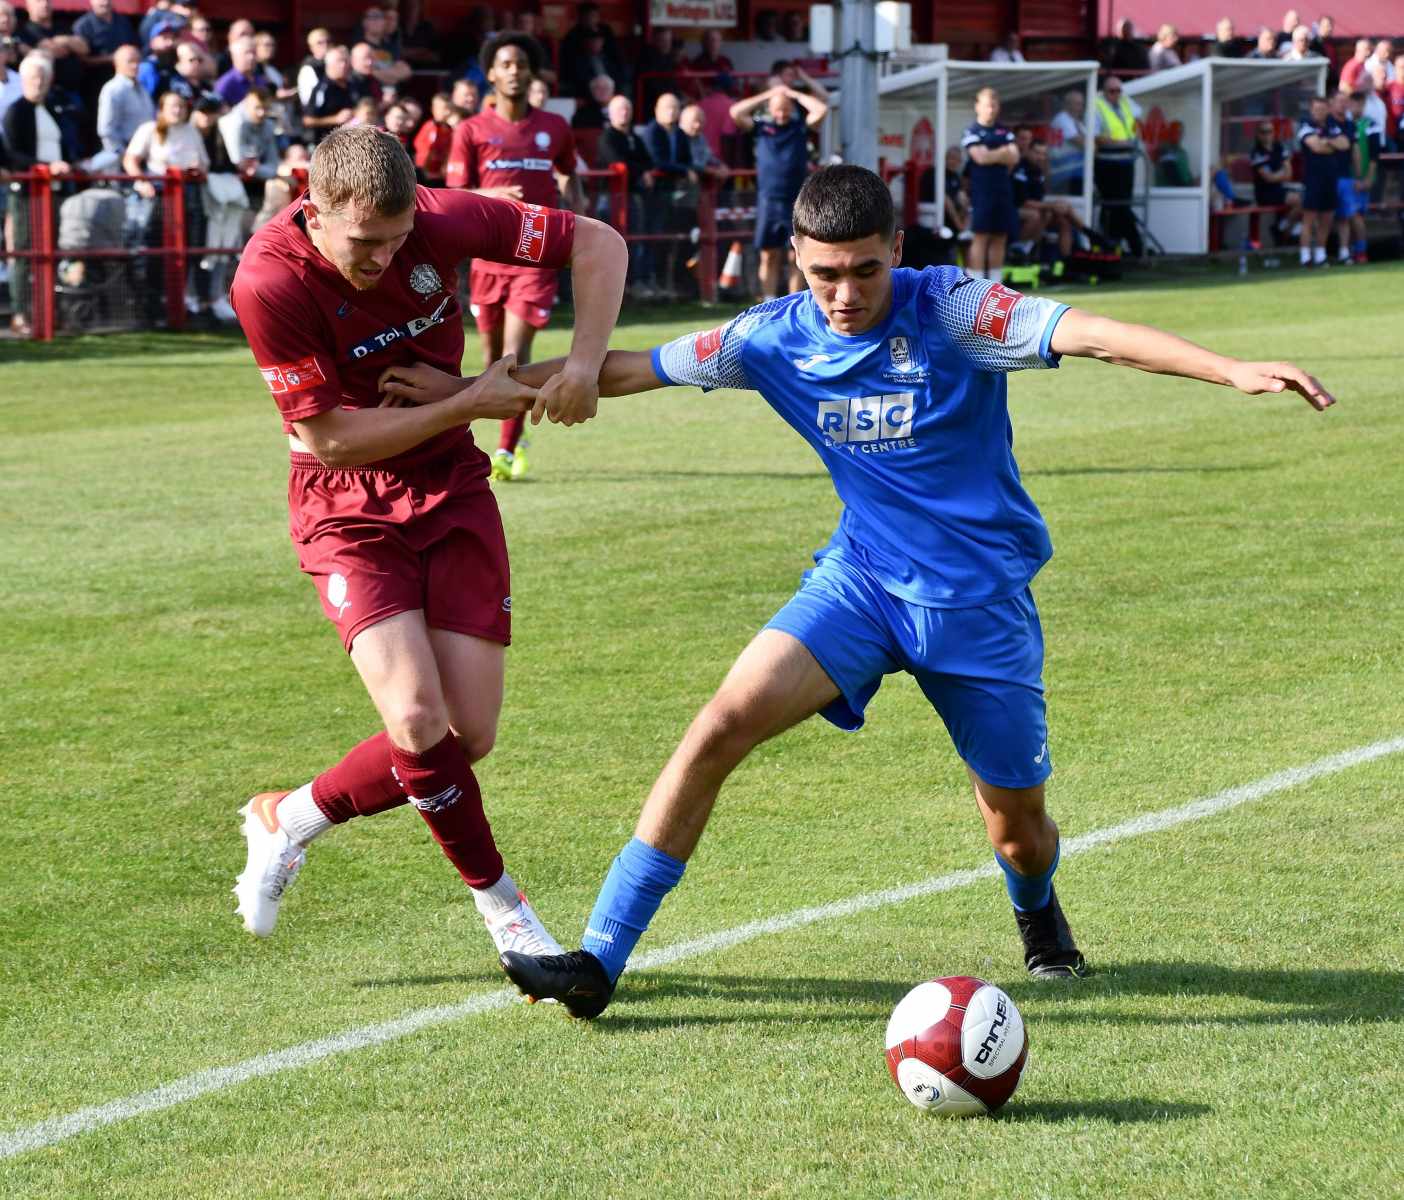 Rowan-Roache-scored-from-the-penalty-spot-Ben-Challis